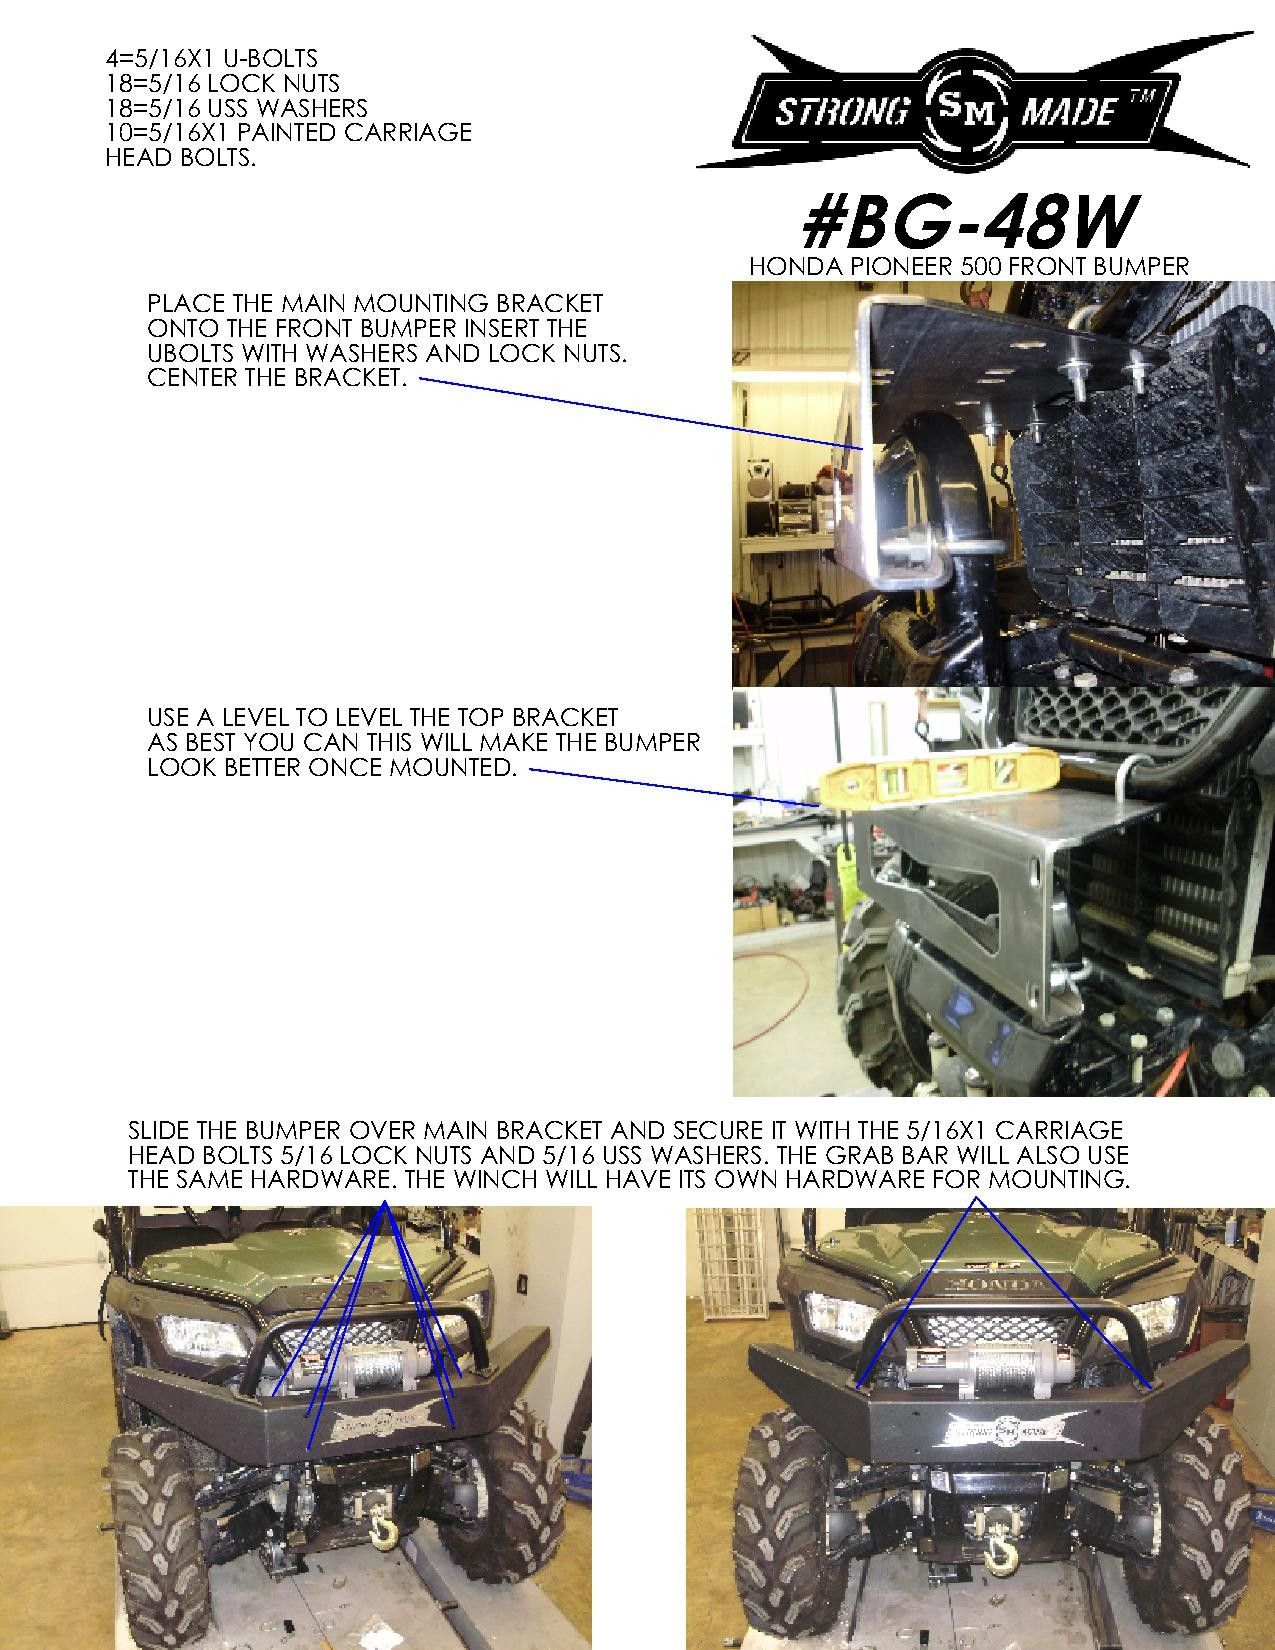 Bg 48w winch series front bumper for 2015 honda pioneer 500 4x4